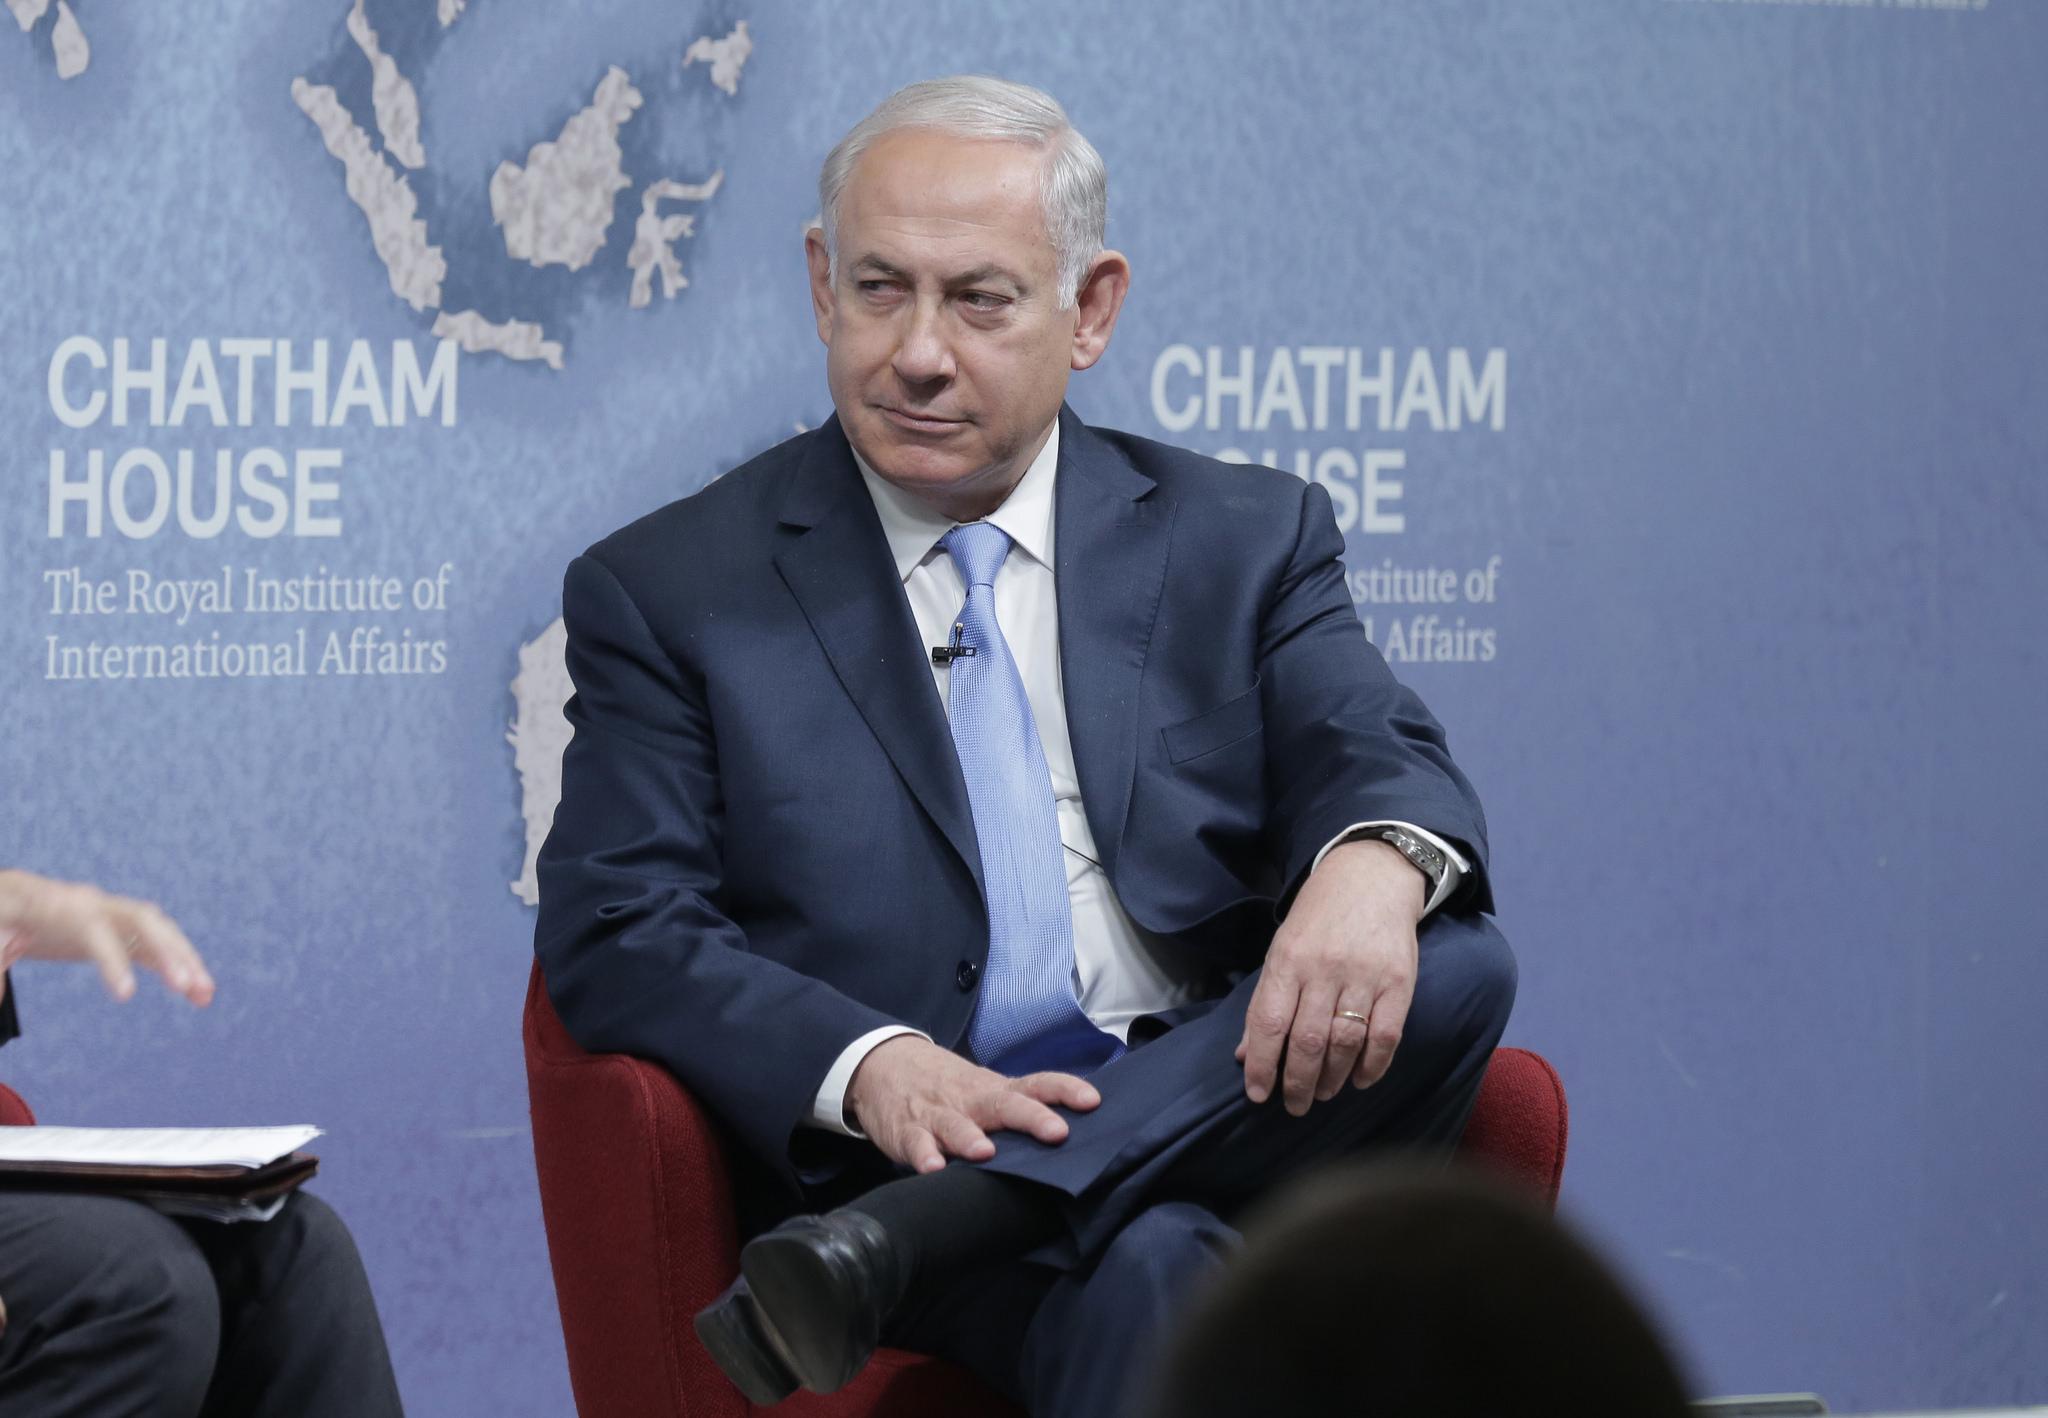 FILE: Benjamin Netanyahu (Photo: Chatham House/Flickr, CC BY 2.0)